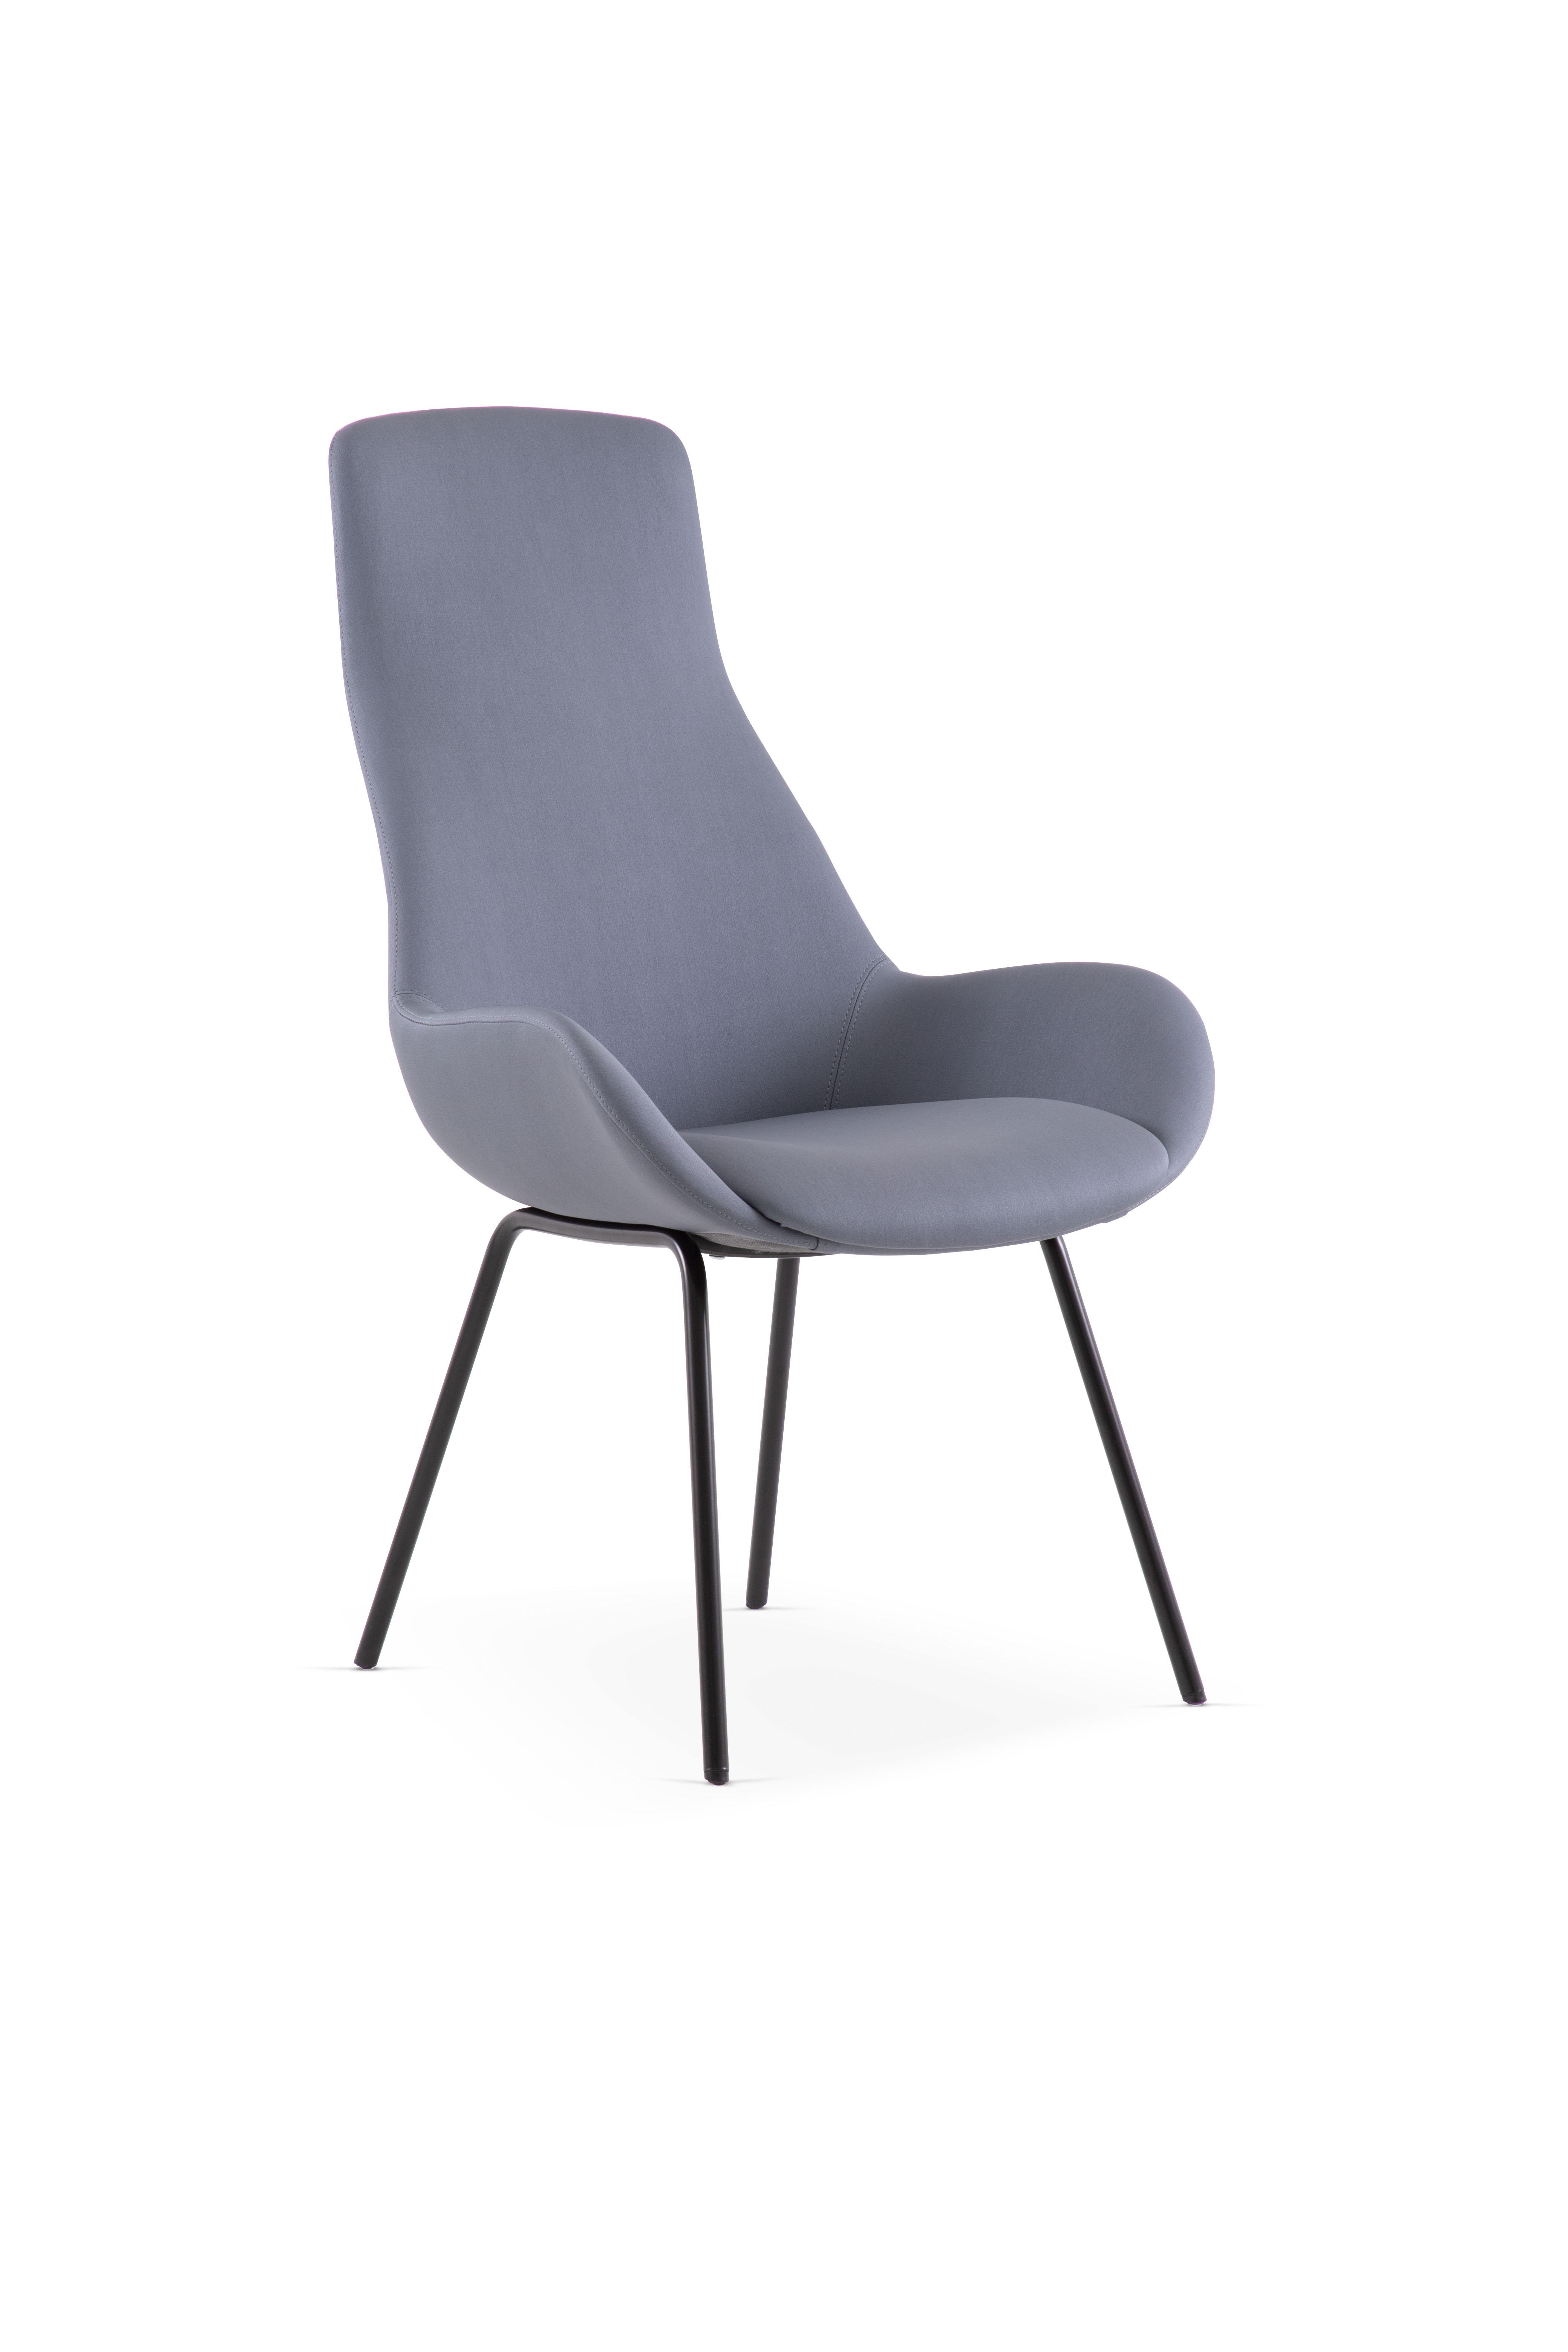 office-chairs_1-1_Club-8.jpg